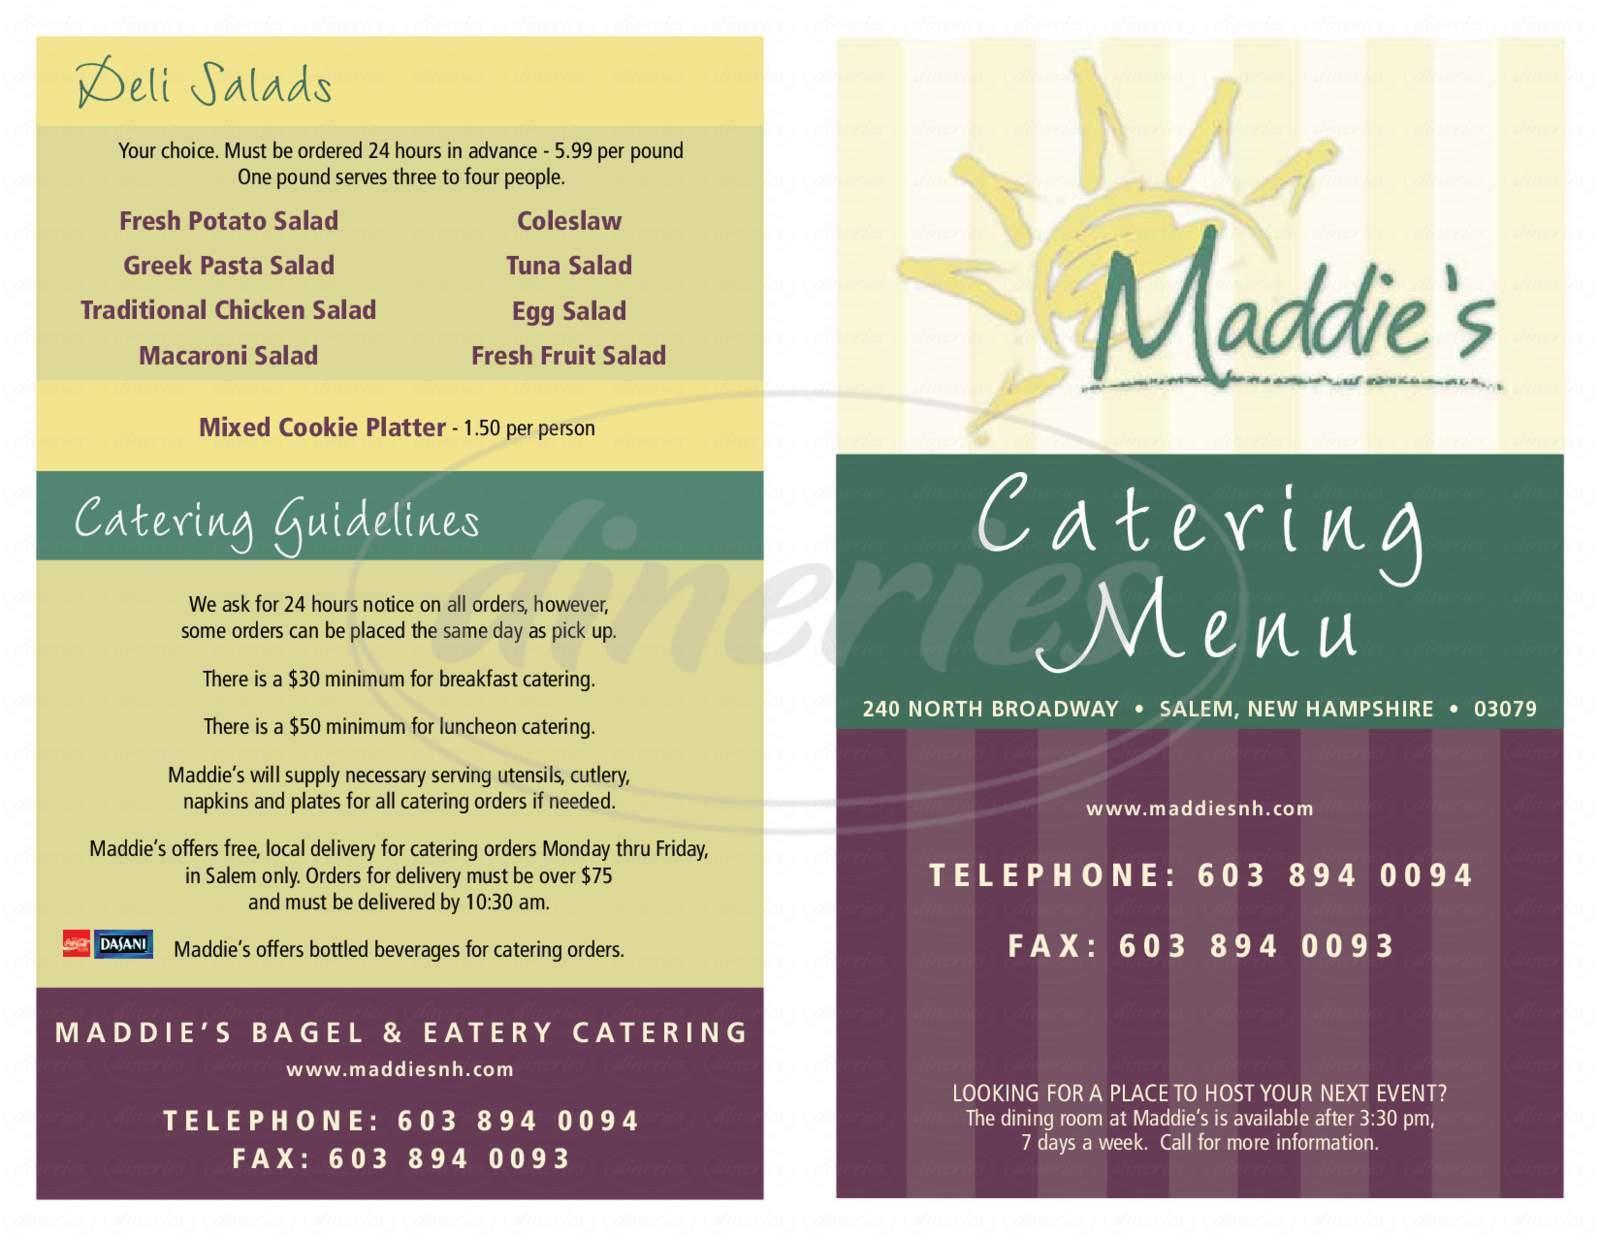 menu for Maddie's Bagel & Eatery